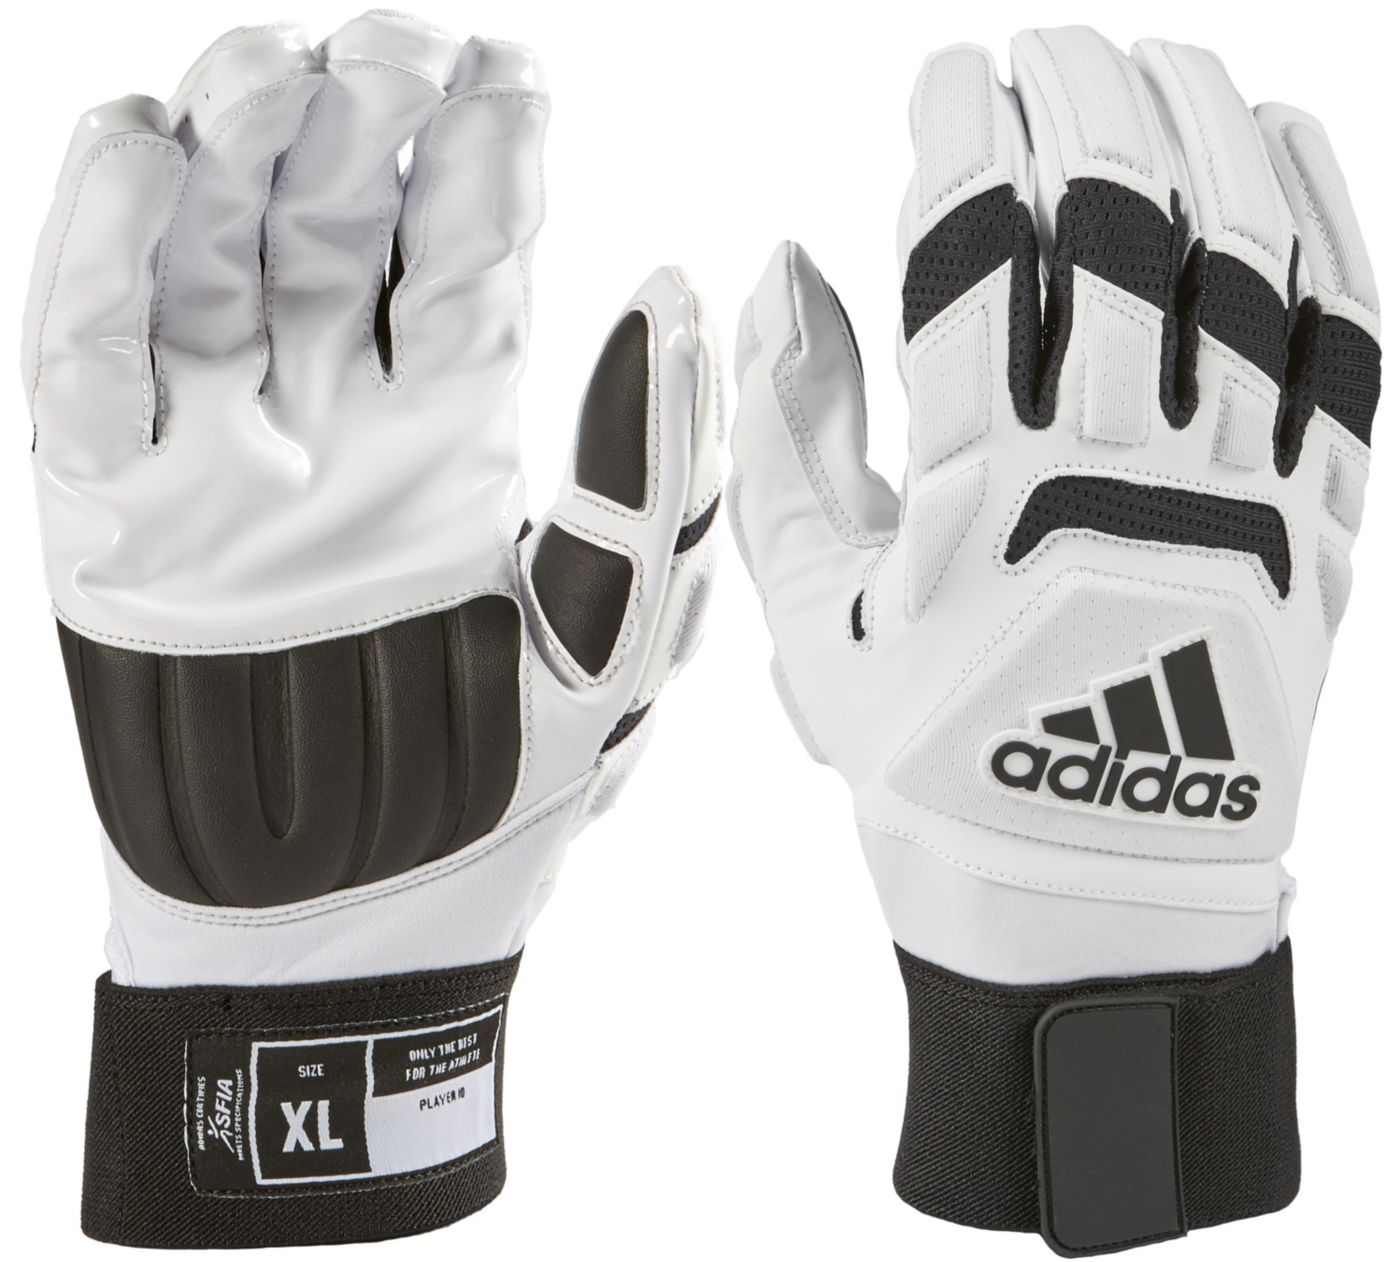 Adidas Freak Max 2.0 Lineman Gloves 2019